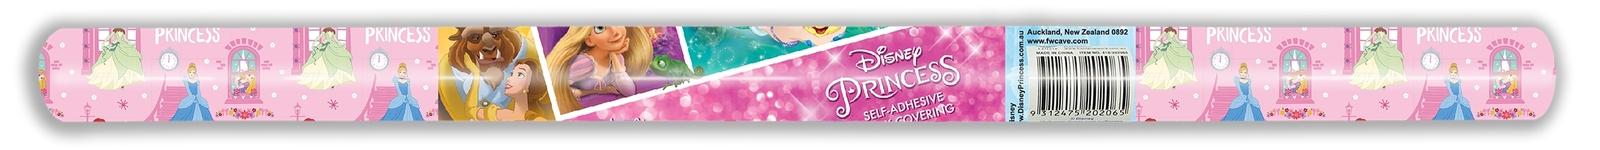 Disney Princess Book Covering (1m) image